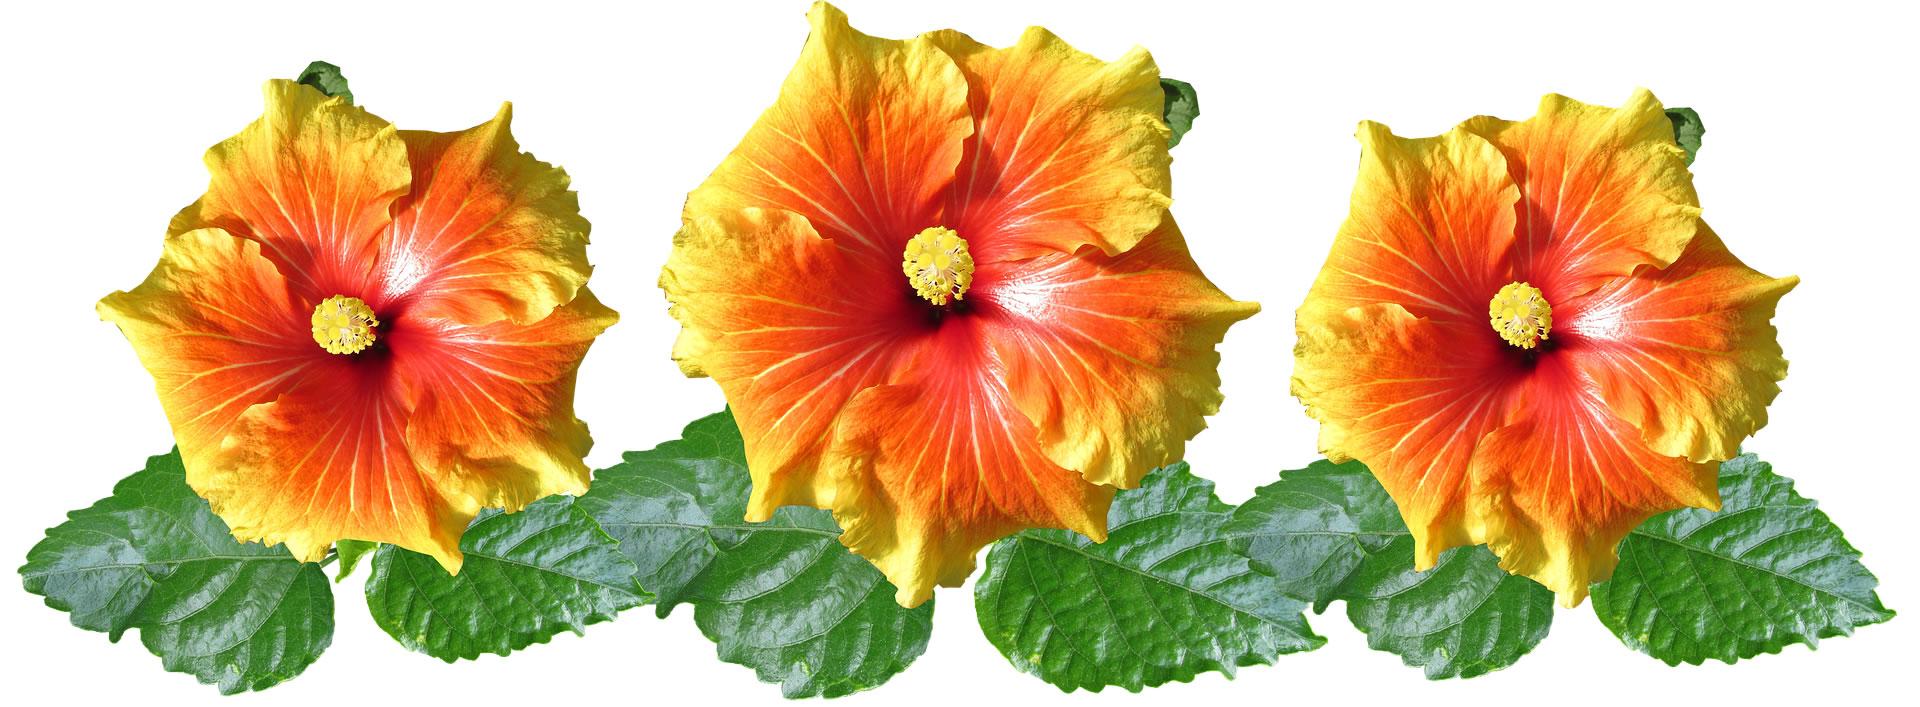 hibiscus-3370253-1920.jpg